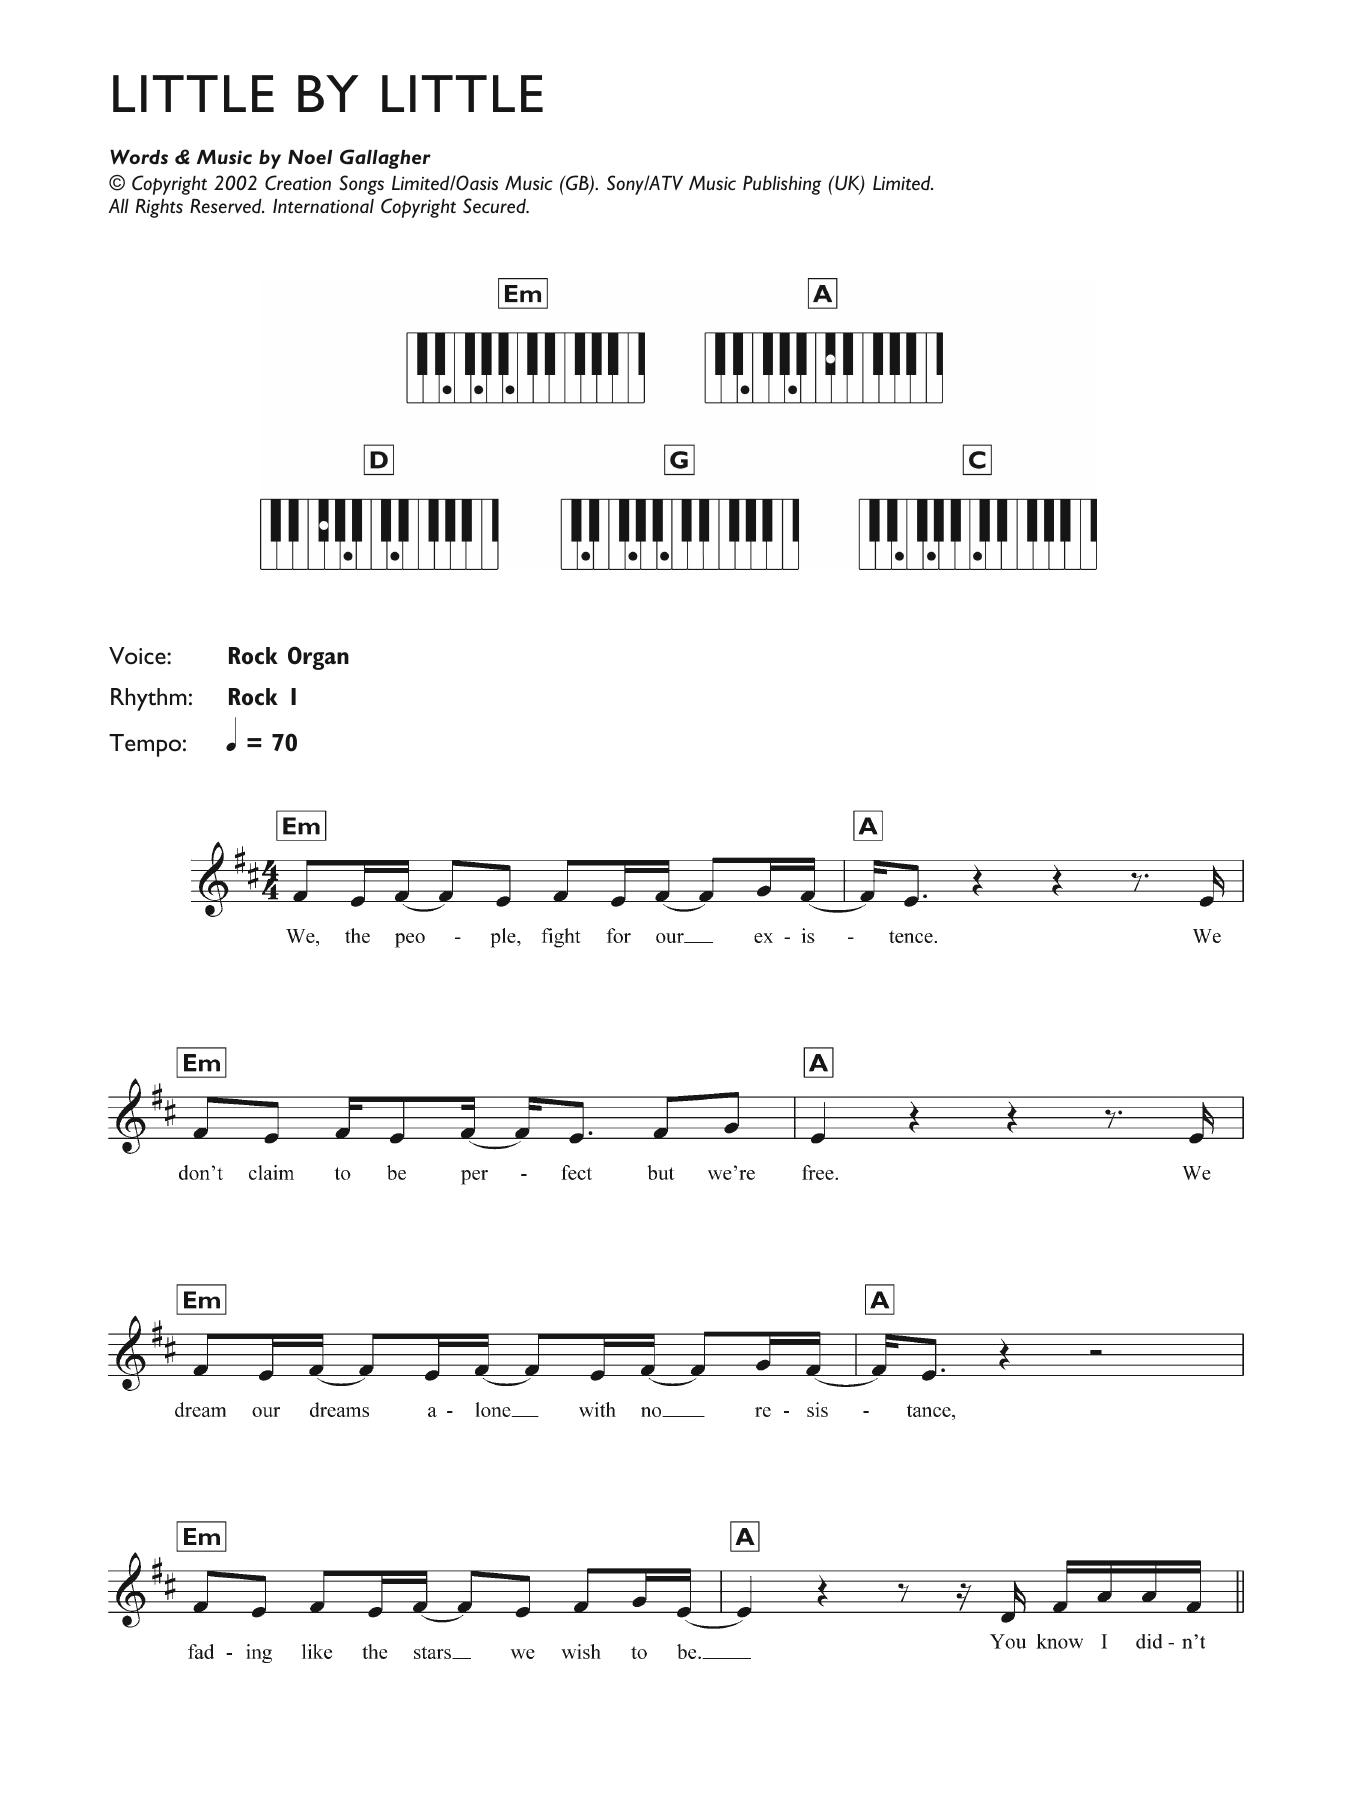 Sheet Music Digital Files To Print Licensed Oasis Digital Sheet Music